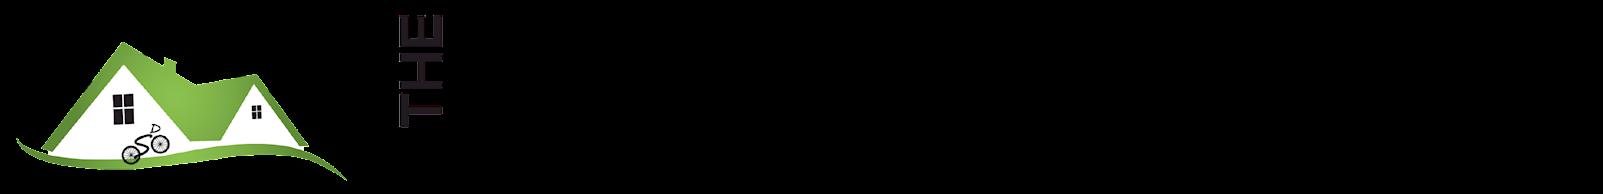 debrun team logo